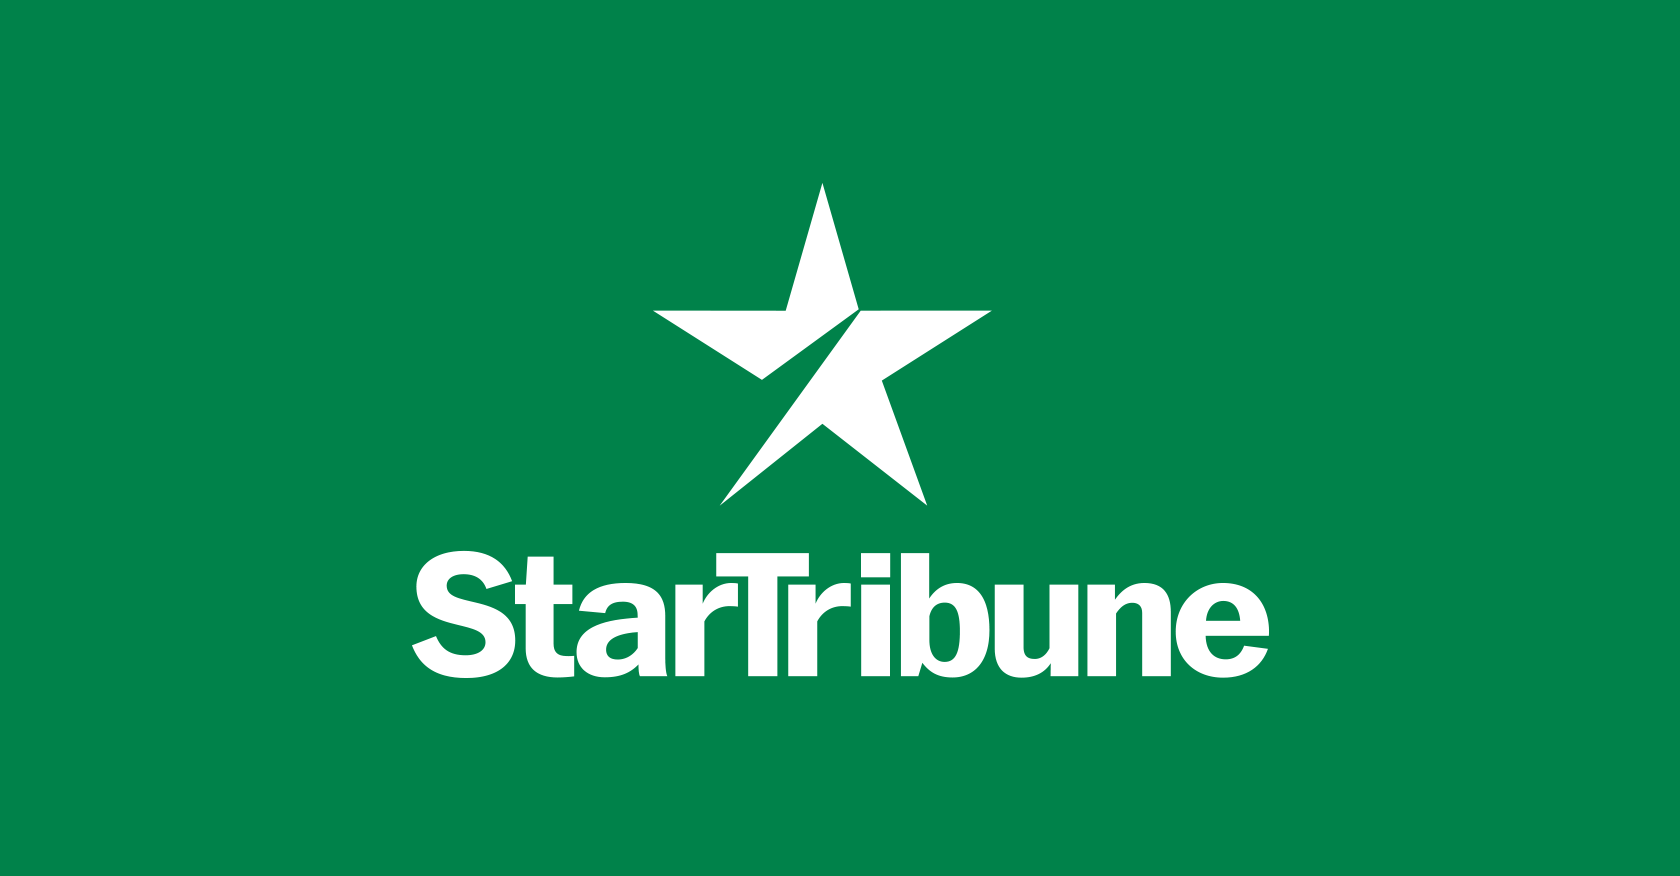 www.startribune.com: California ethnic studies debate: Whose stories get told?